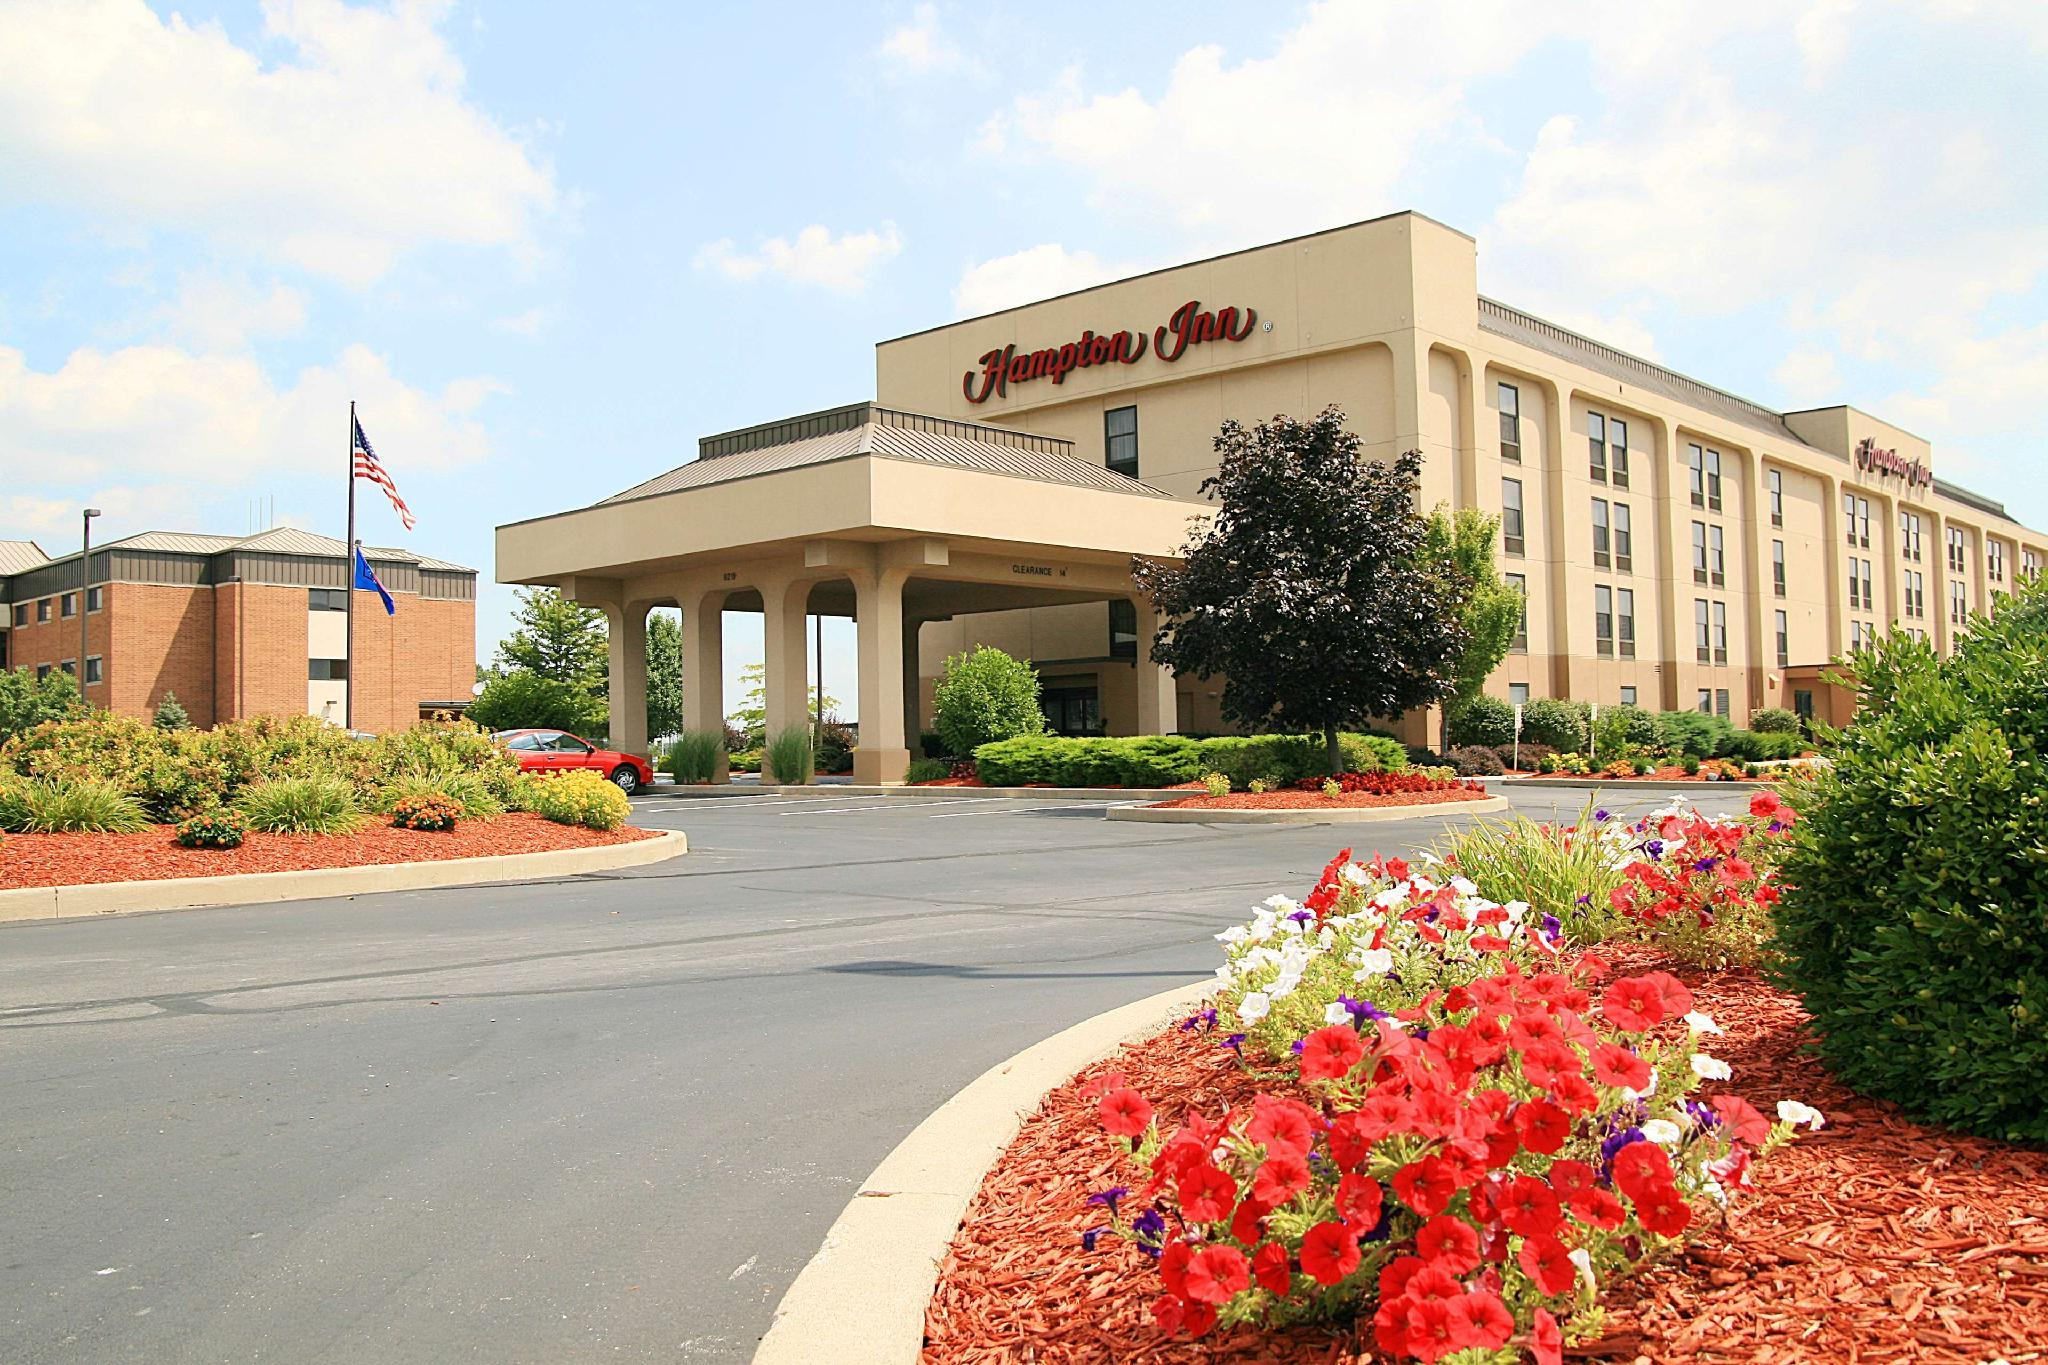 Hampton Inn Fort Wayne Southwest Hotel